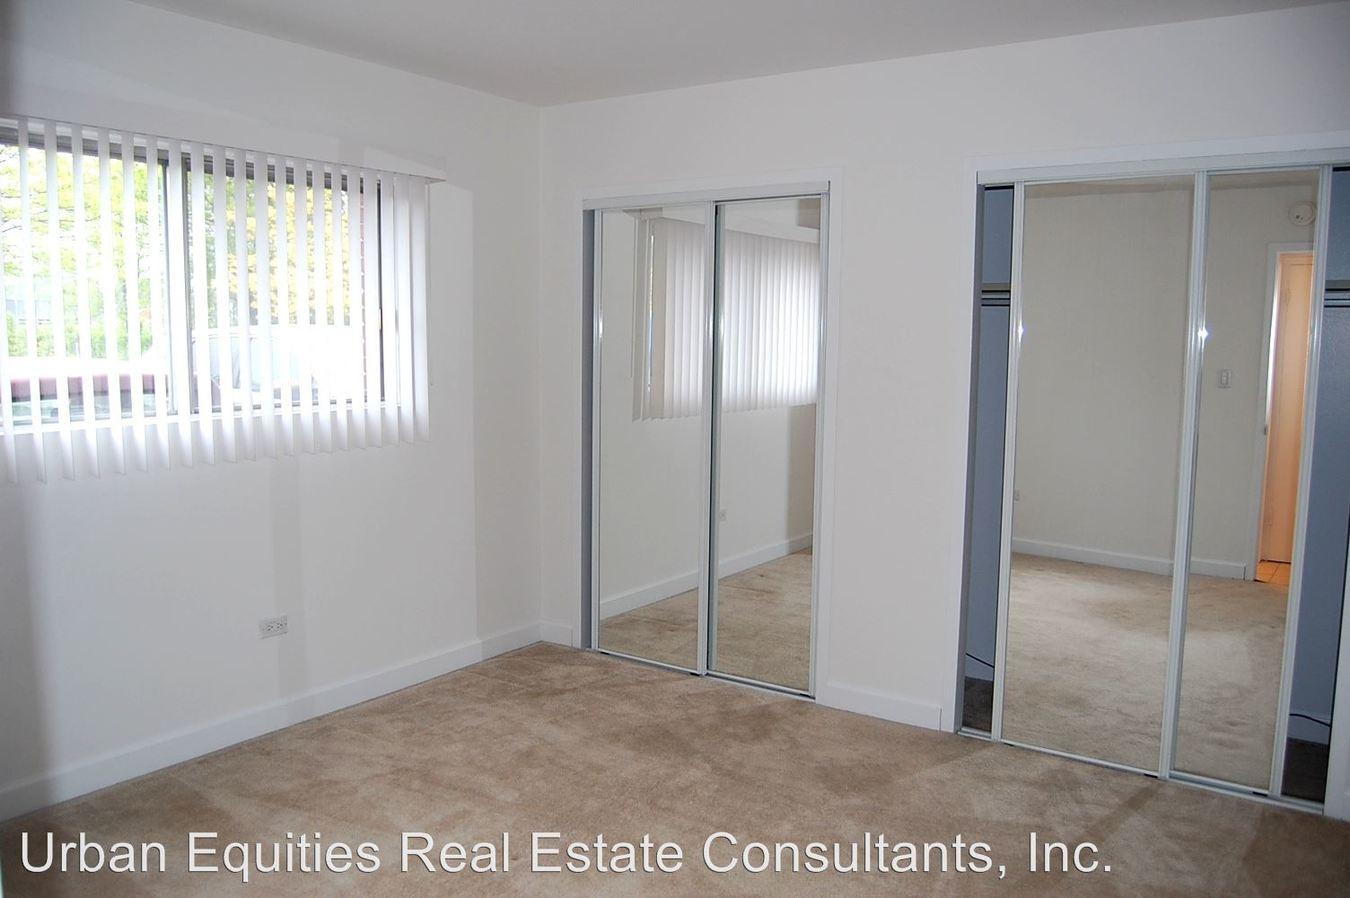 1 Bedroom 1 Bathroom Apartment for rent at Elmcrest Apartments Llc 140/150/160 E. Lake Street in Elmhurst, IL